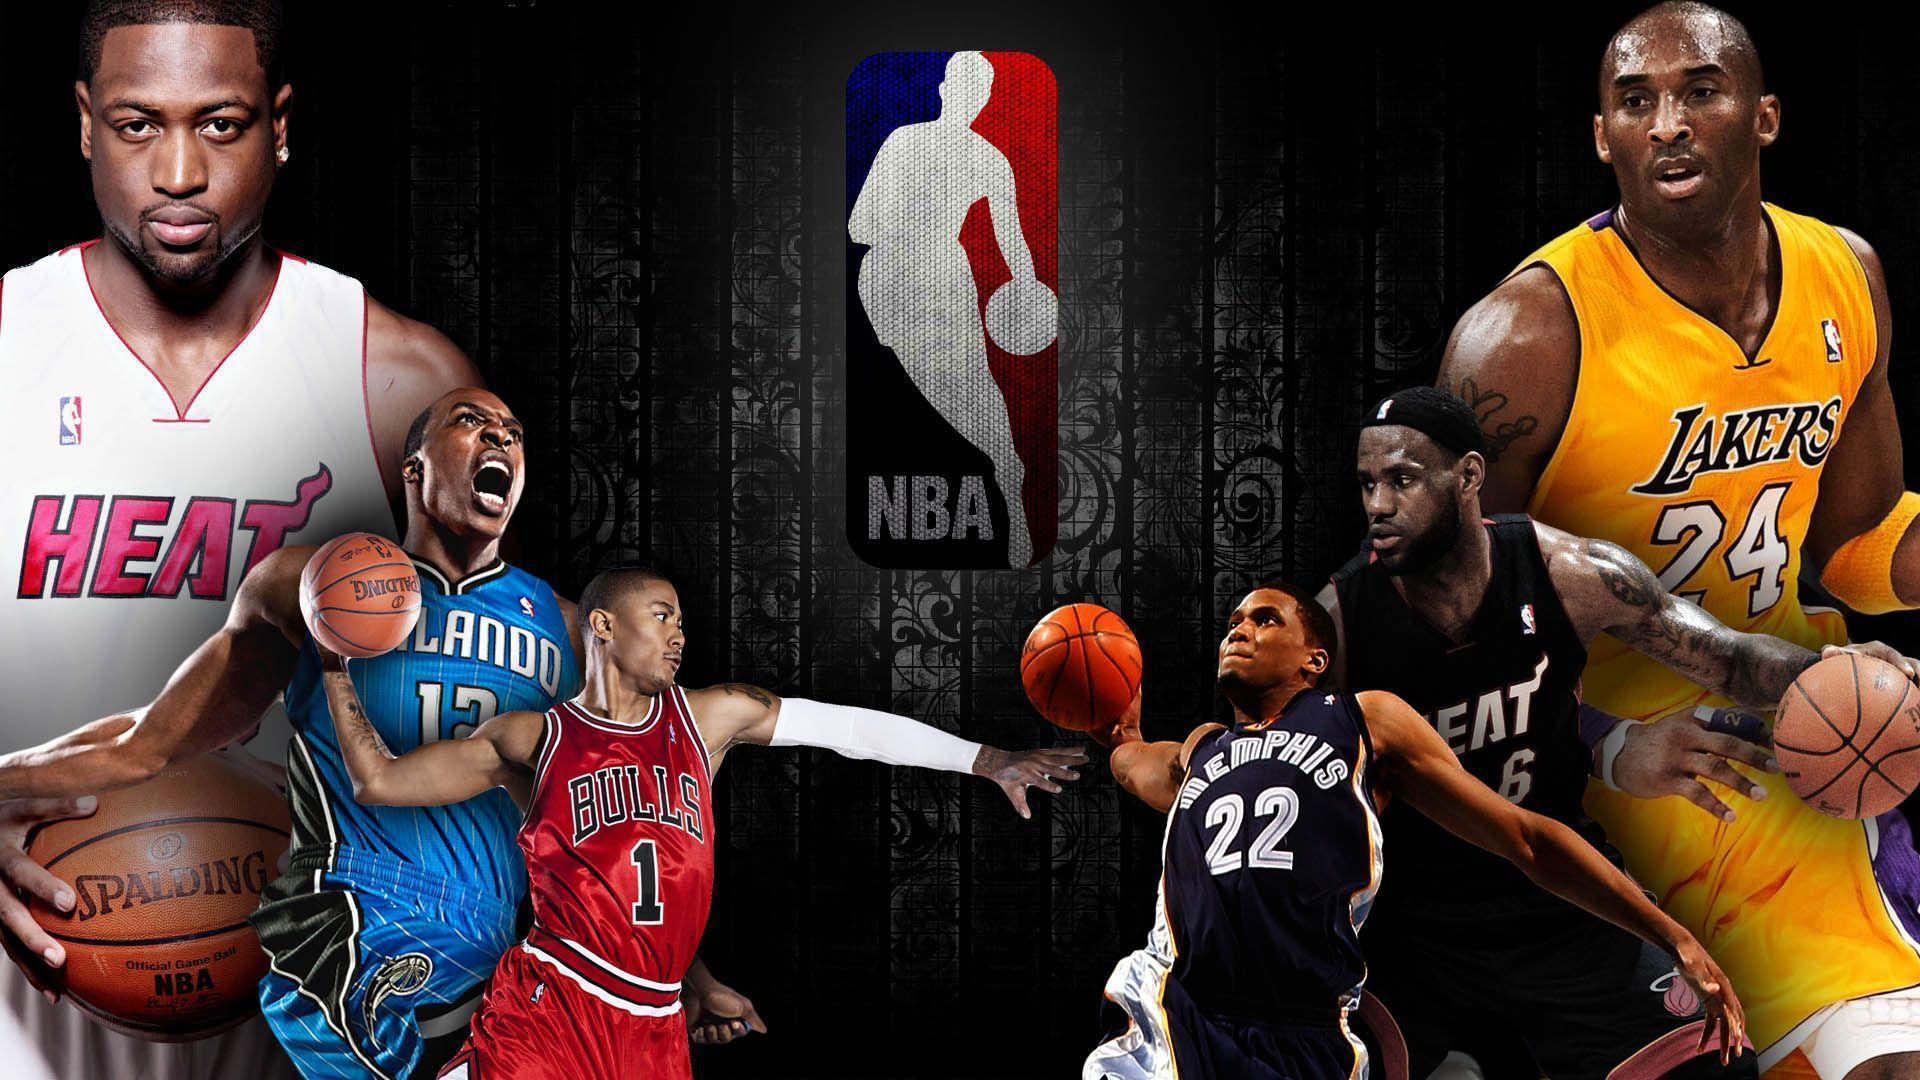 NBA Player Wallpapers - Wallpaper Cave